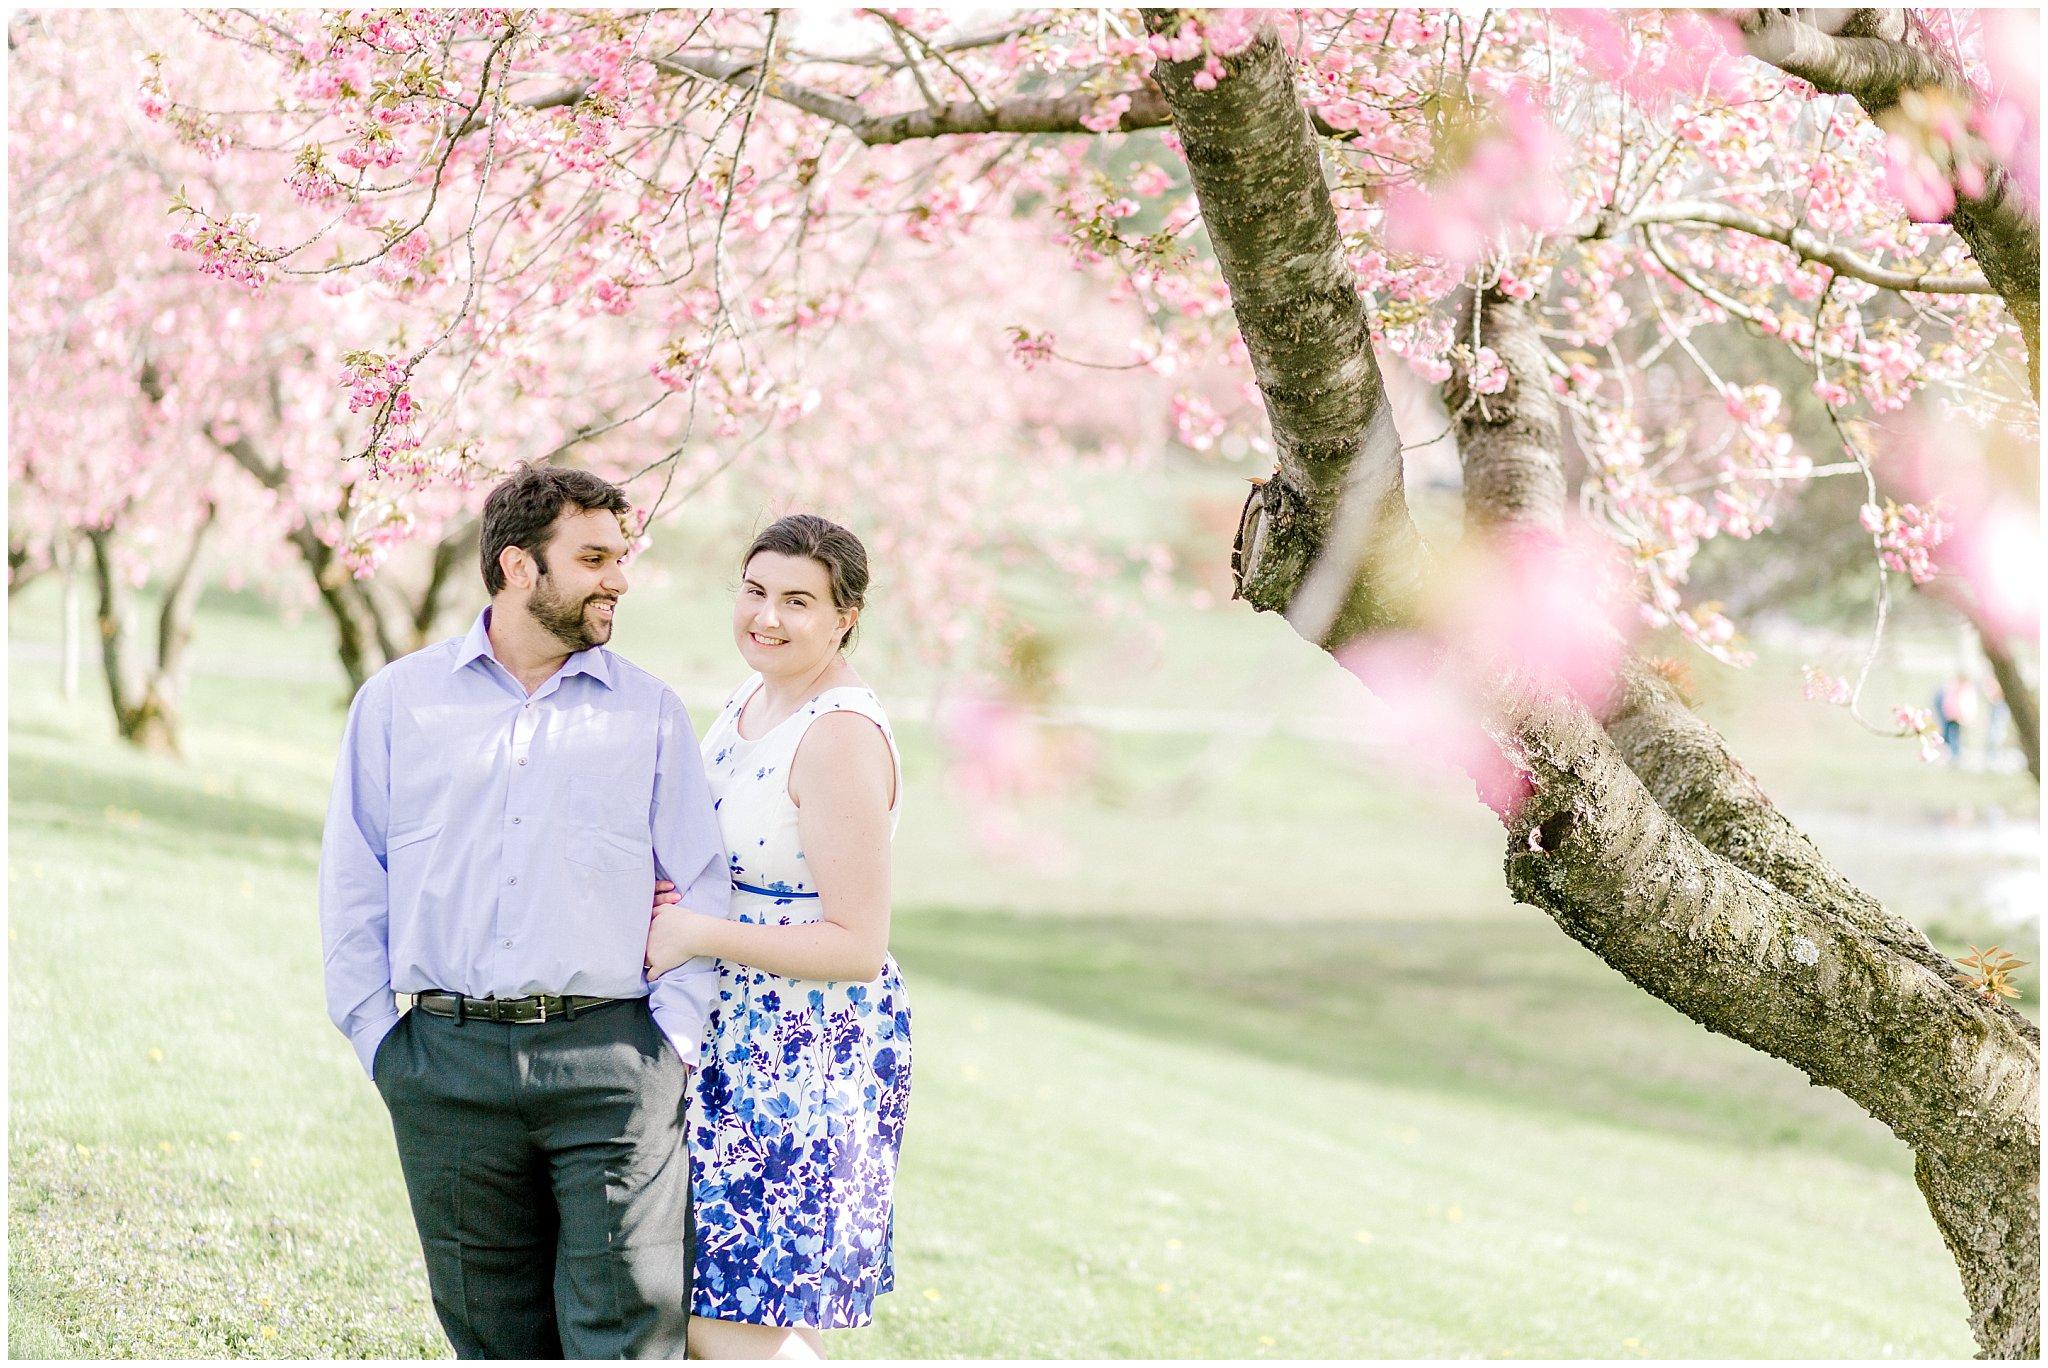 Lehigh Valley Spring Cherry Blossom Engagement Session Pennsylvania Wedding Photographer (10).jpg